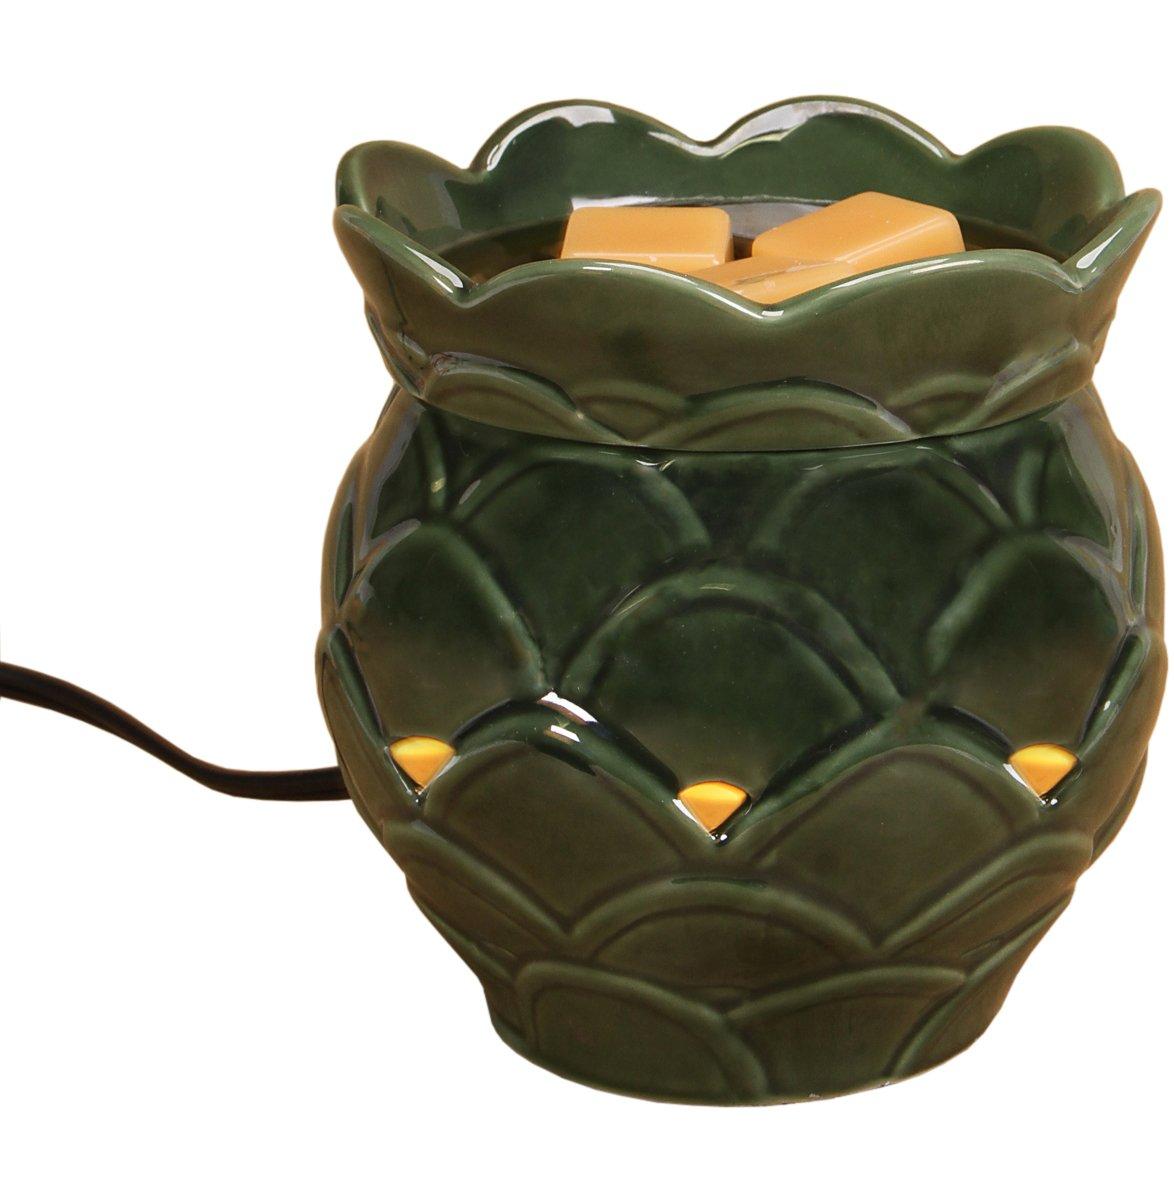 DARICE CCW-009 68 Wax Melter Artichoke, Multicolor